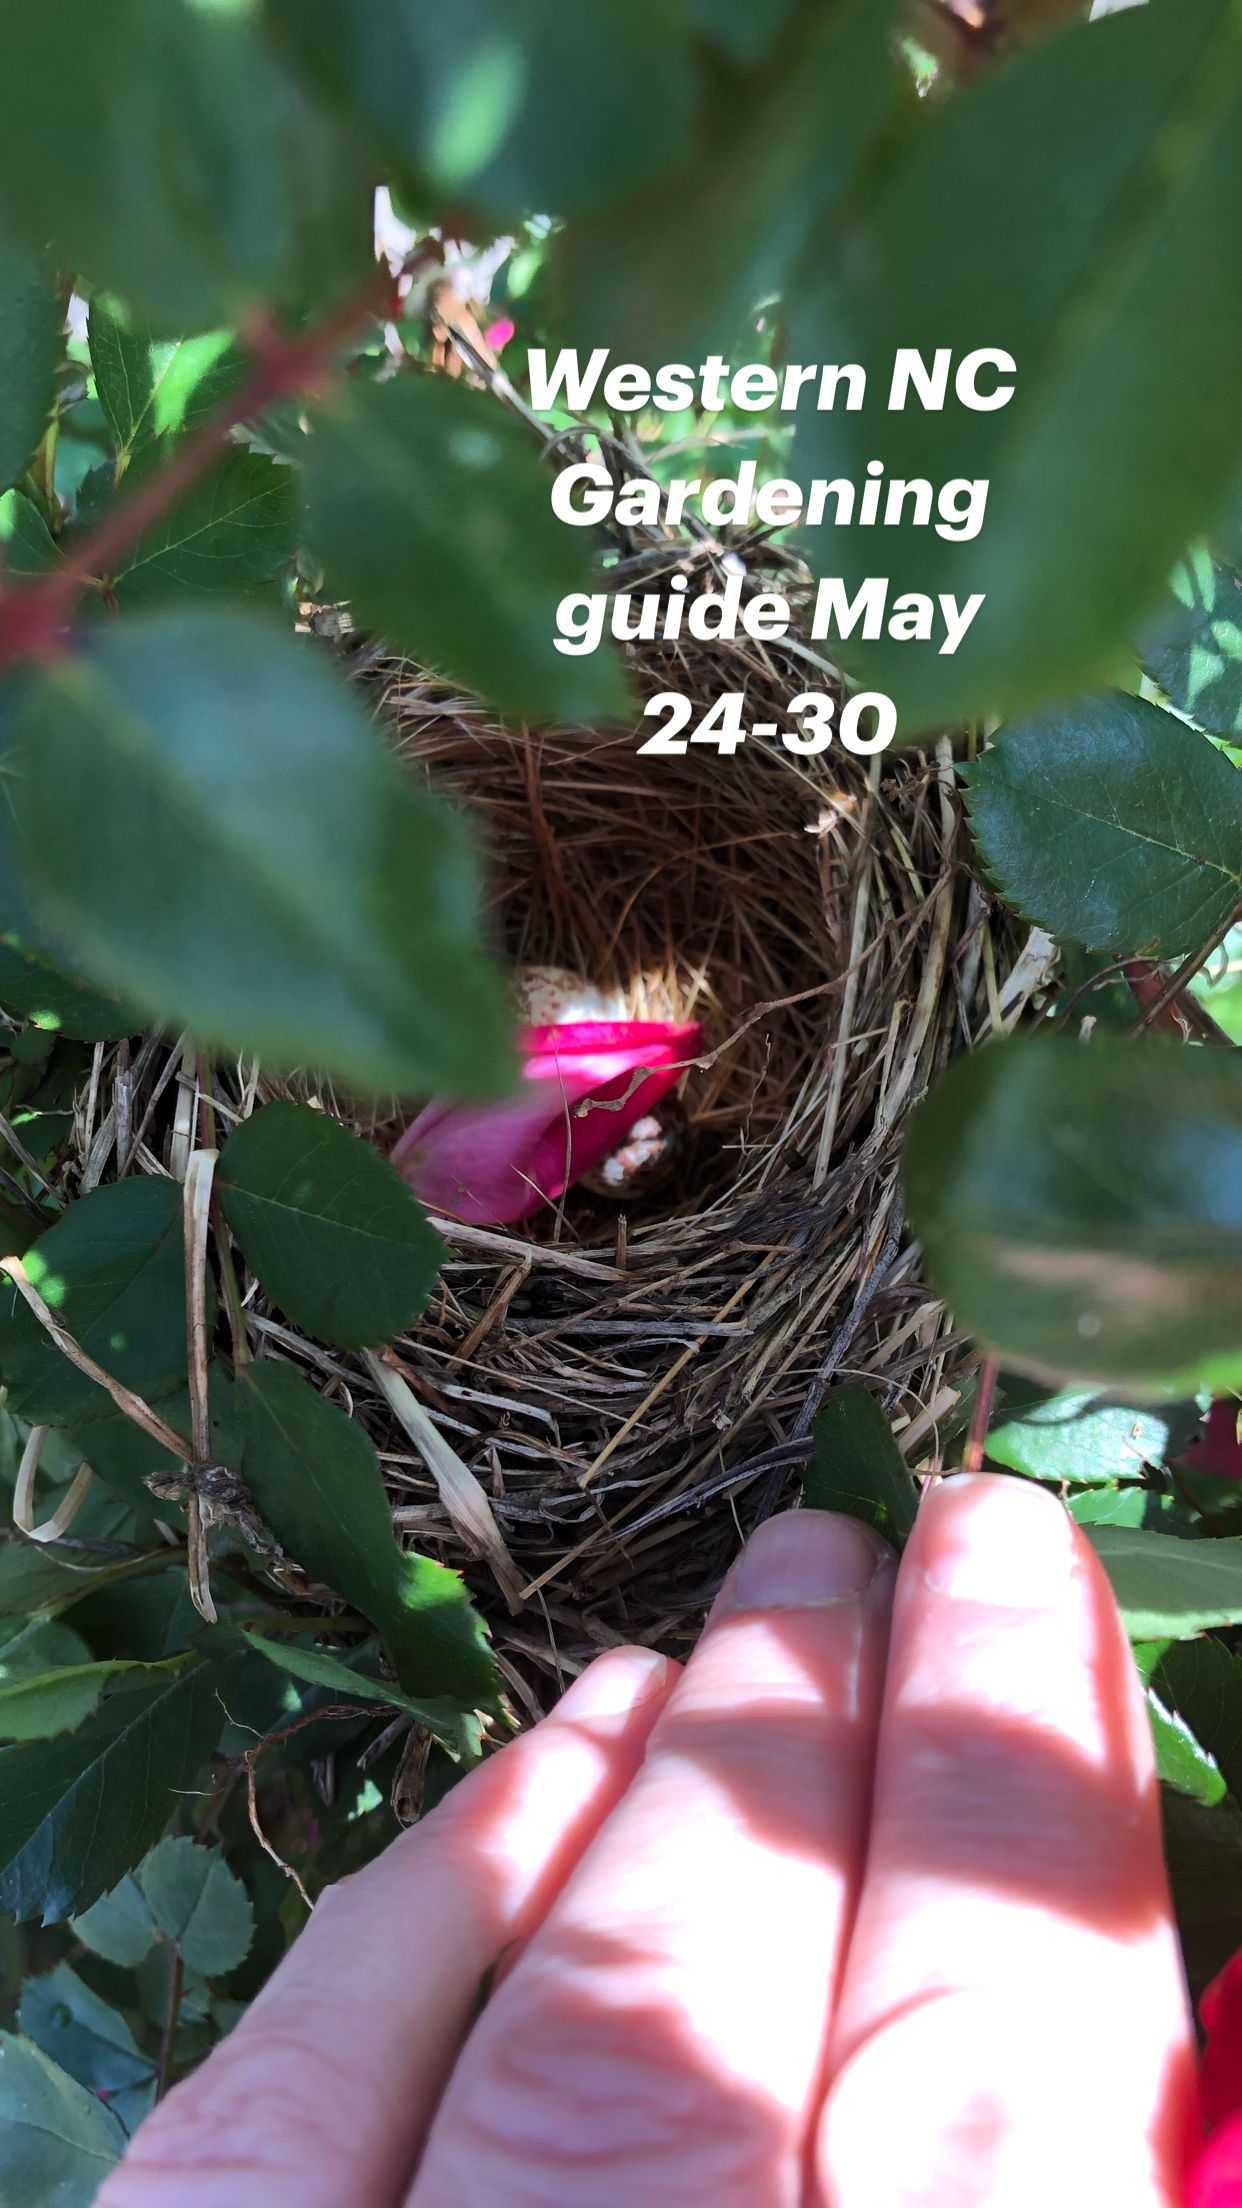 Western NC  Gardening guide May 24-30